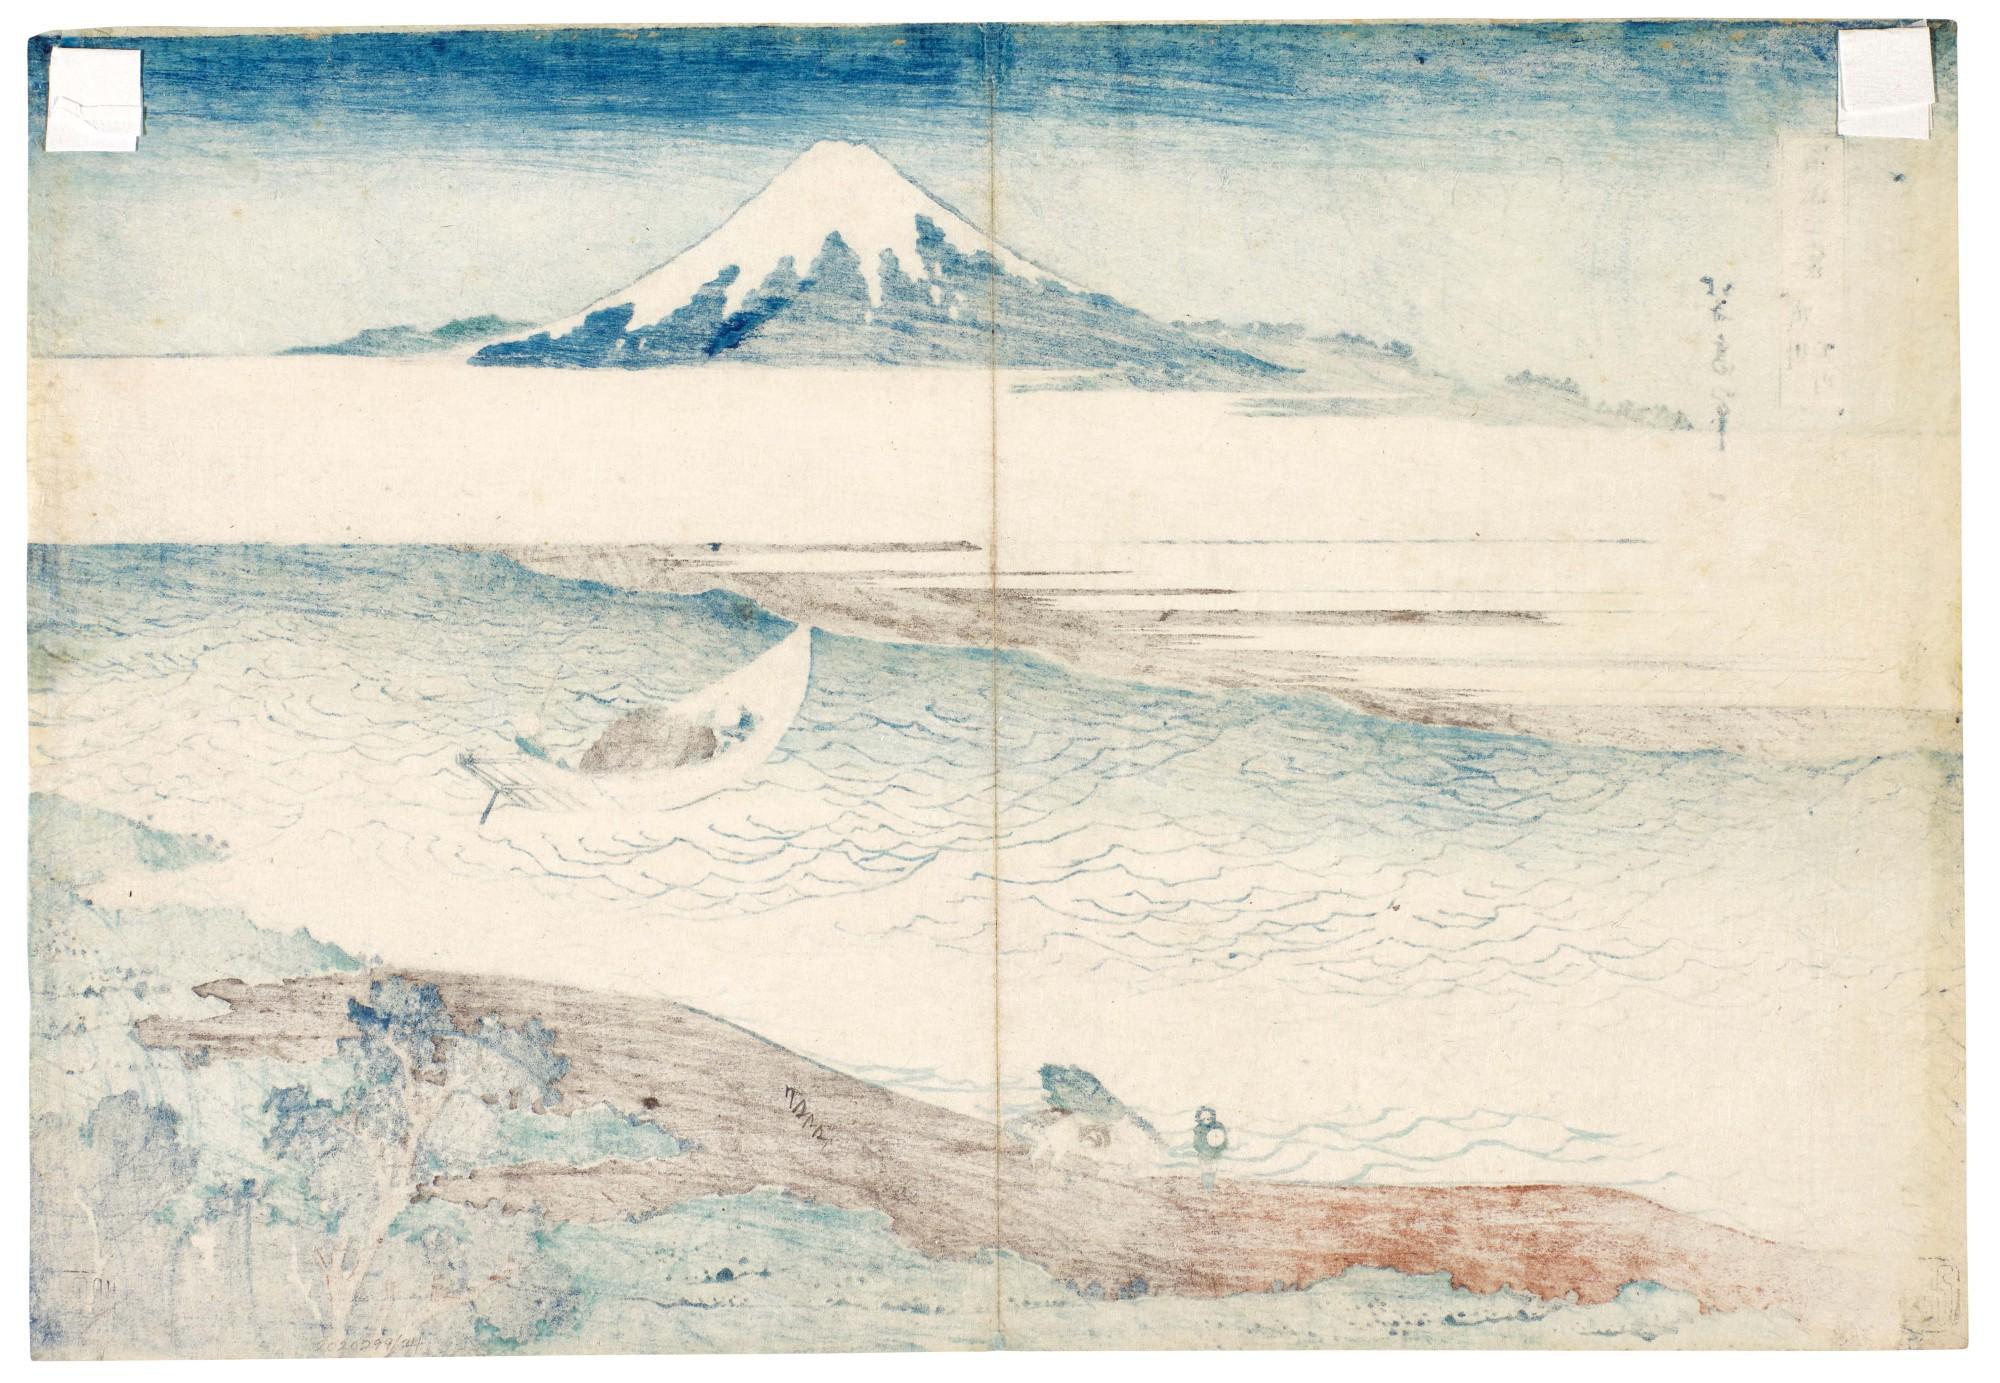 Katsushika Hokusai 1760 1849 Tama River In Musashi Province Bushu Tamagawa Edo Period 19th Century Private Collection Of Fine Japanese Prints Japanese Sotheby S